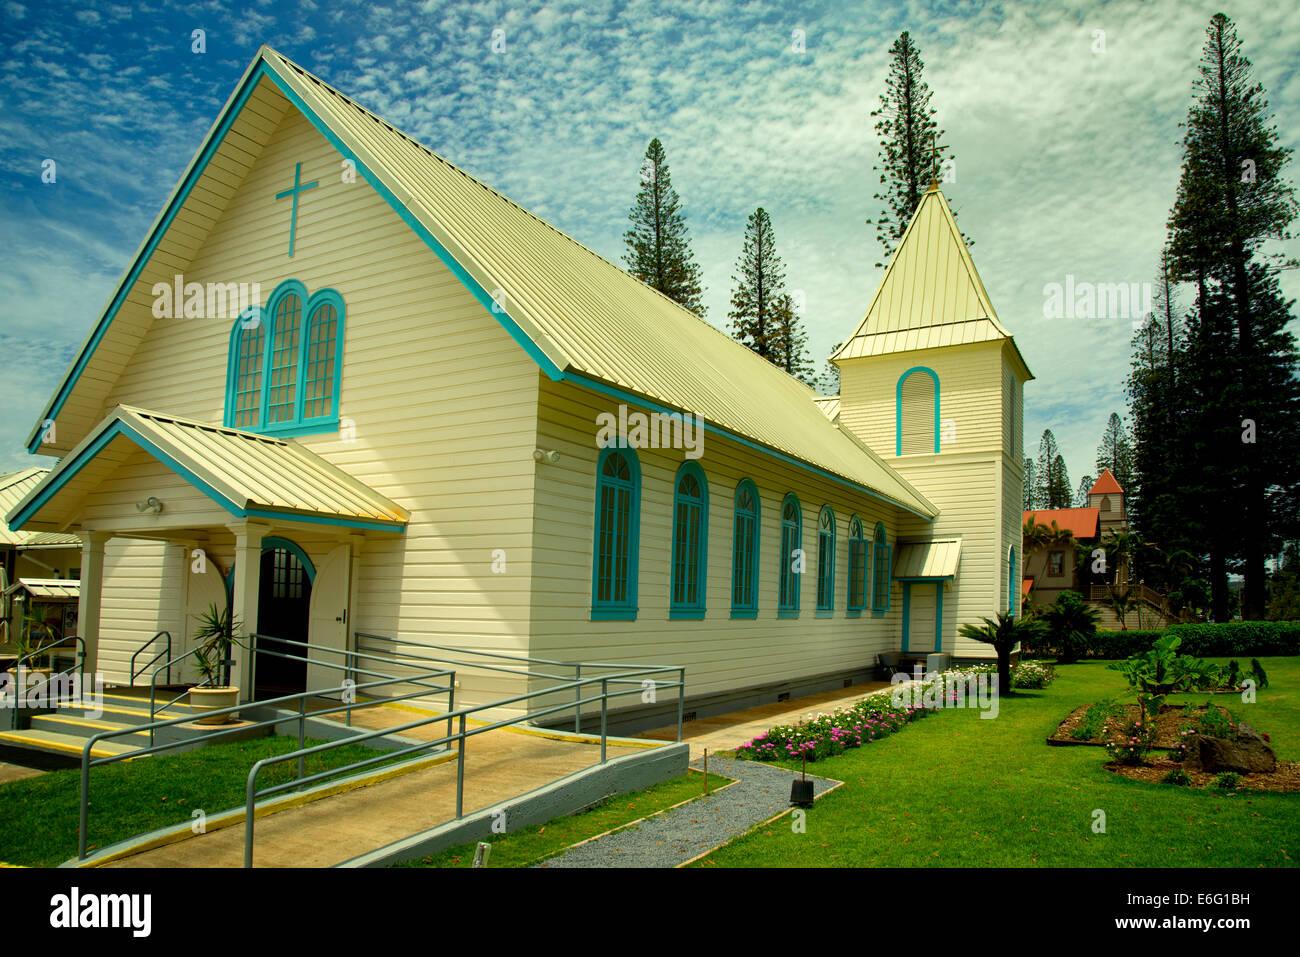 Sacred Hearts Jesus & Mary Catholic Church. Lanai City, Lanai, Hawaii - Stock Image